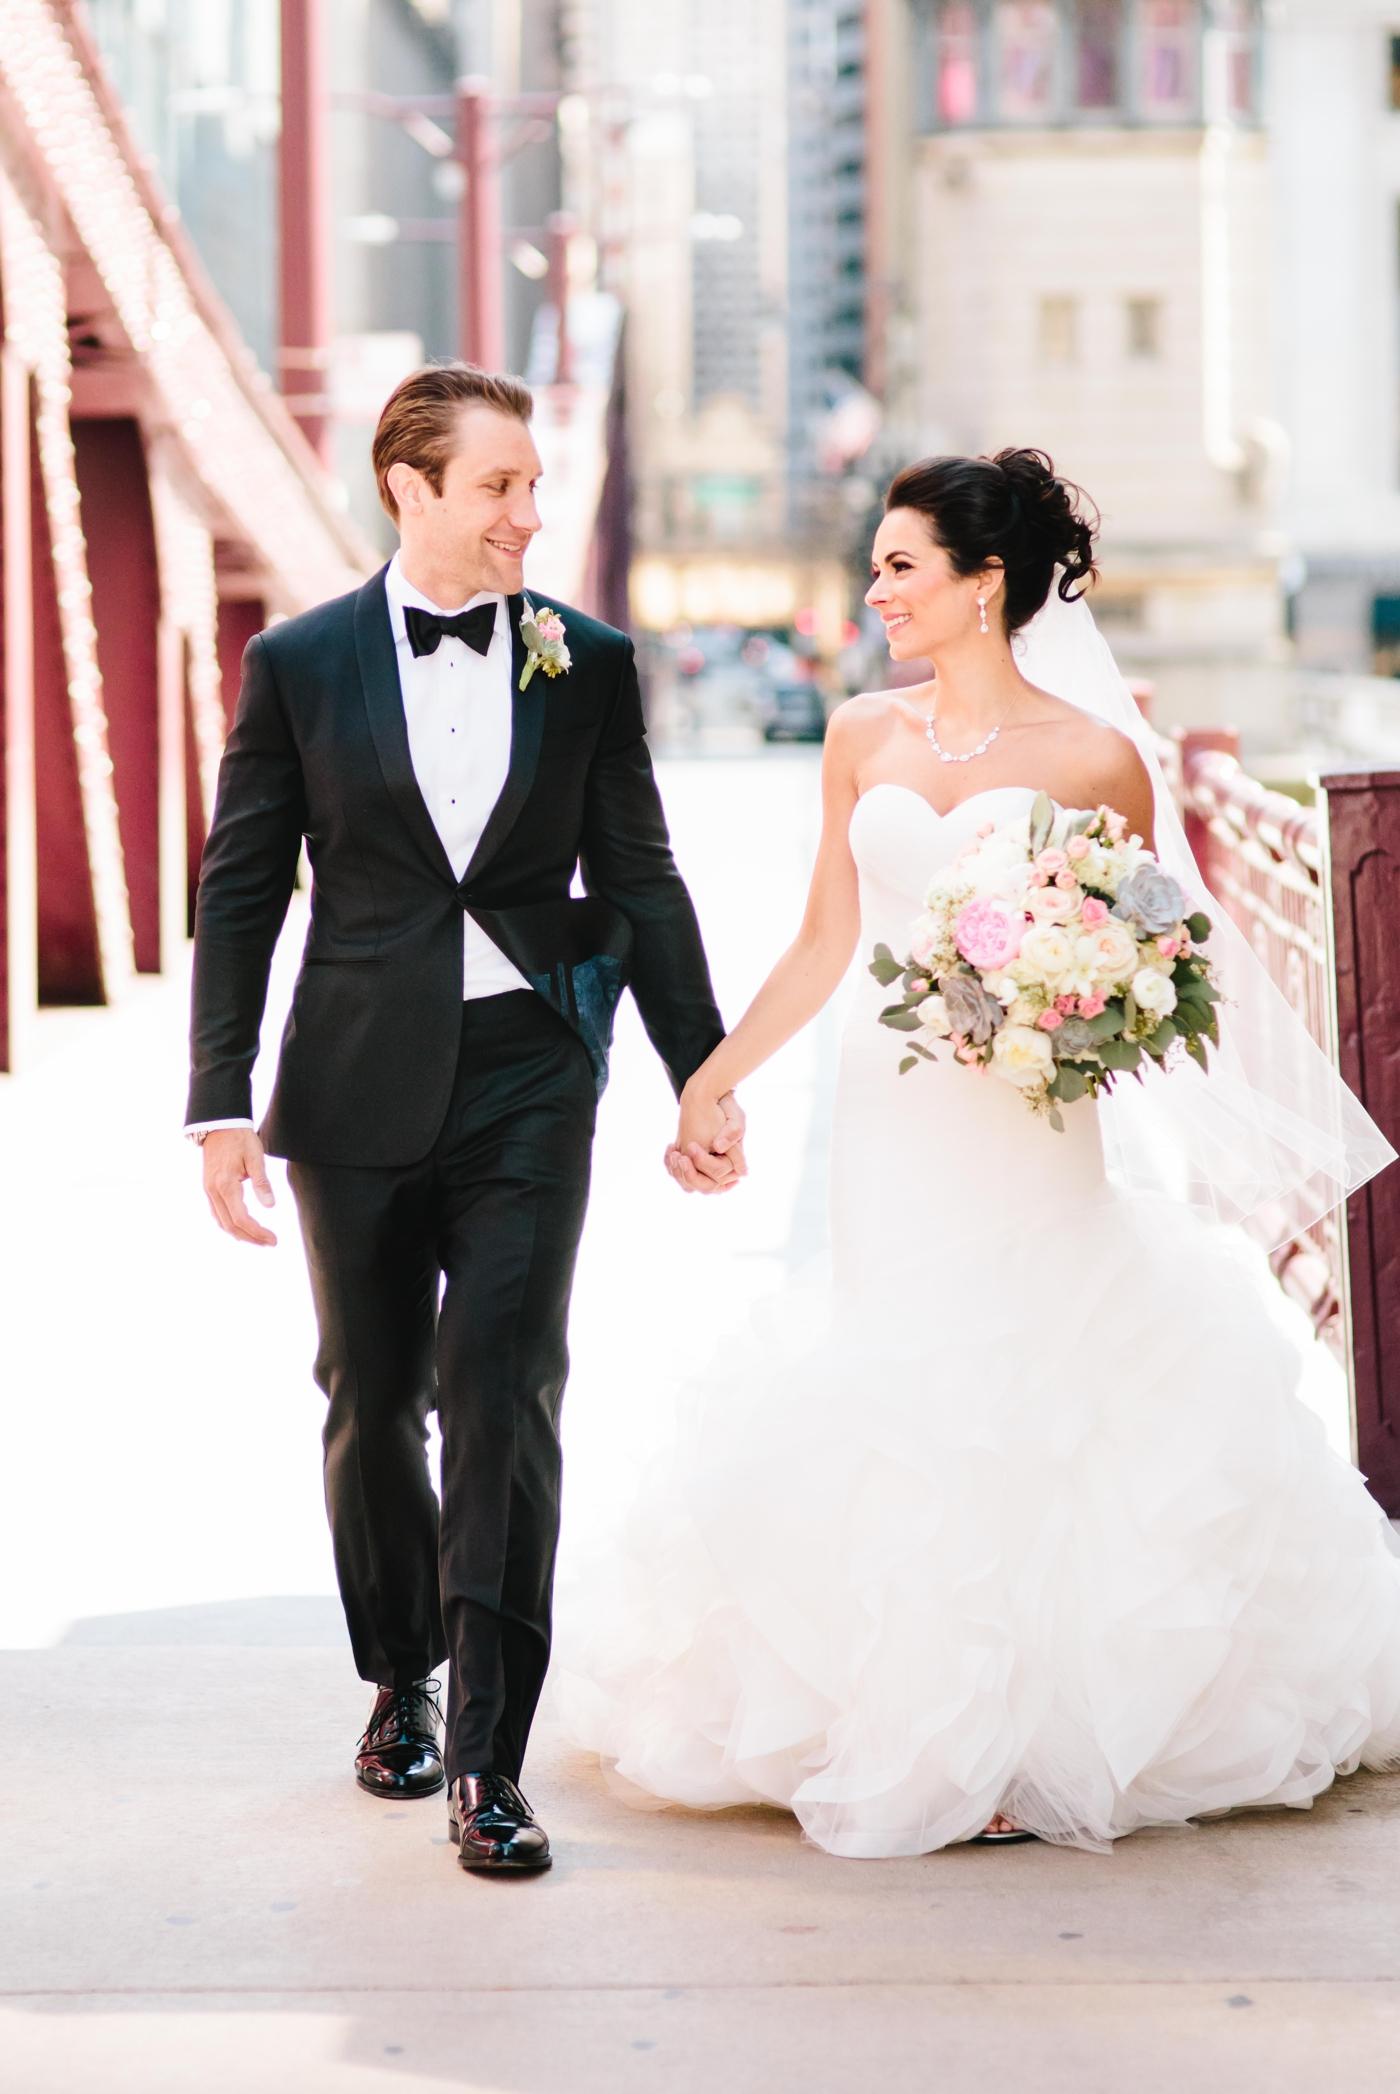 chicago-fine-art-wedding-photography-hamm26